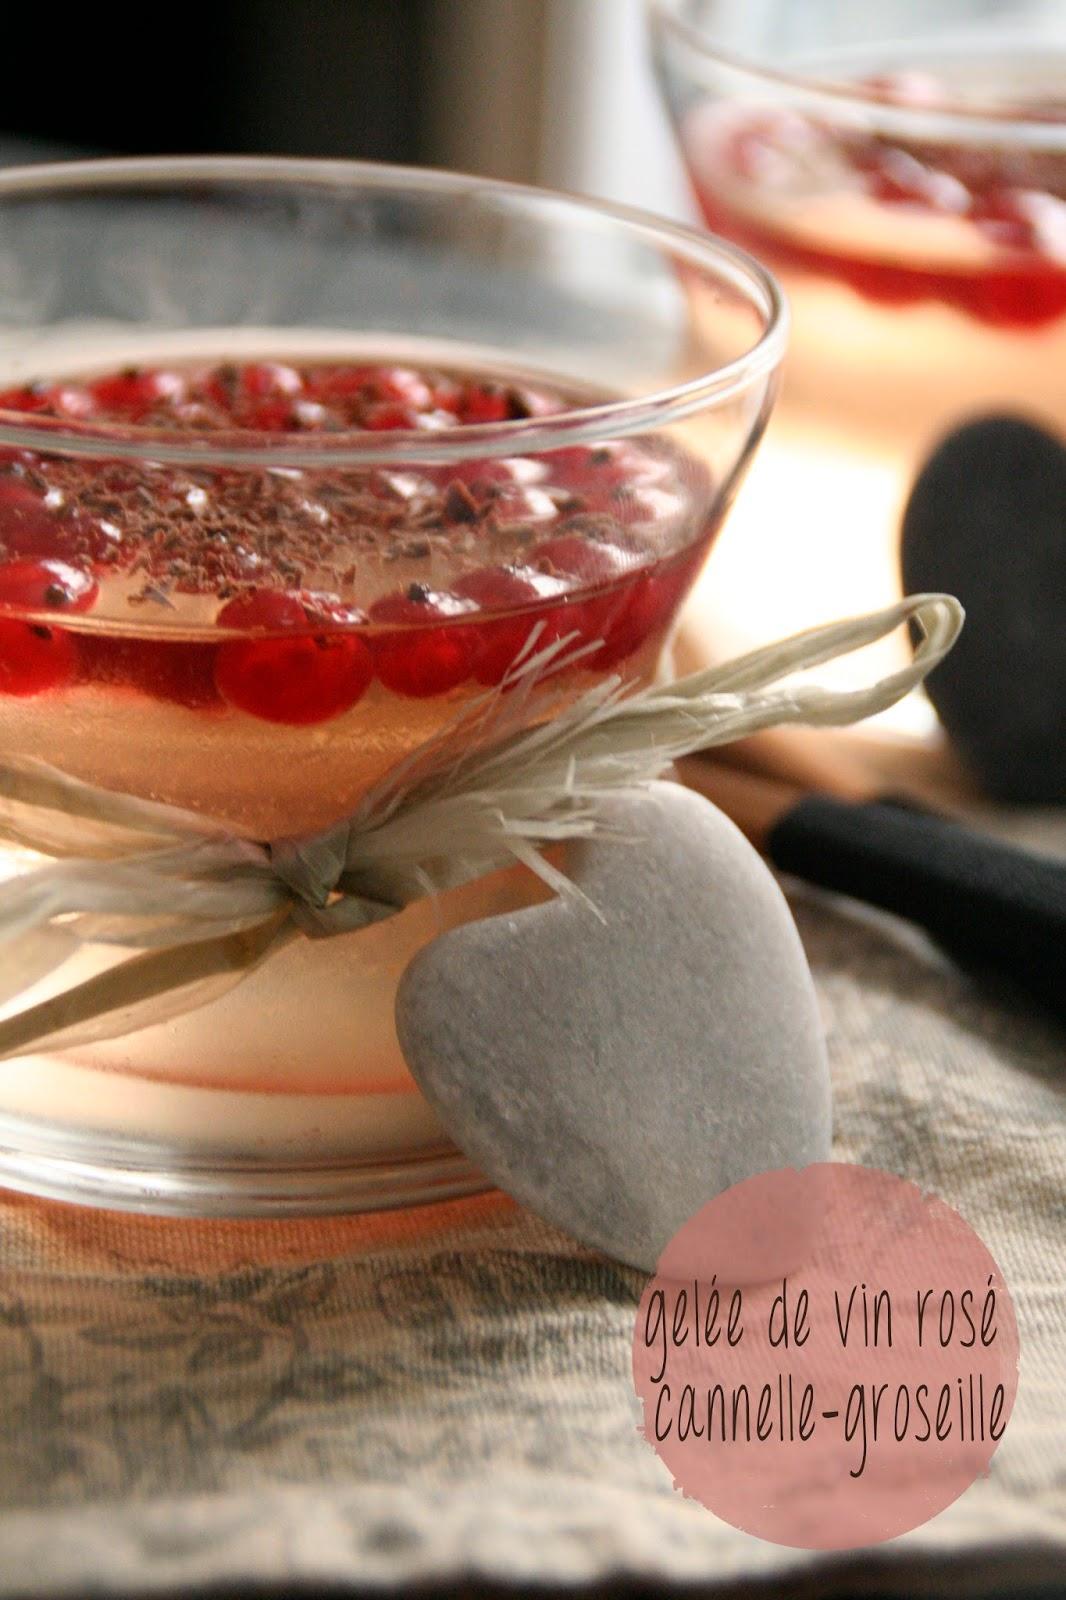 http://etcharlottedecouvritlacuisine.blogspot.fr/2014/07/gelee-de-vin-rose-cannelle-groseille.html